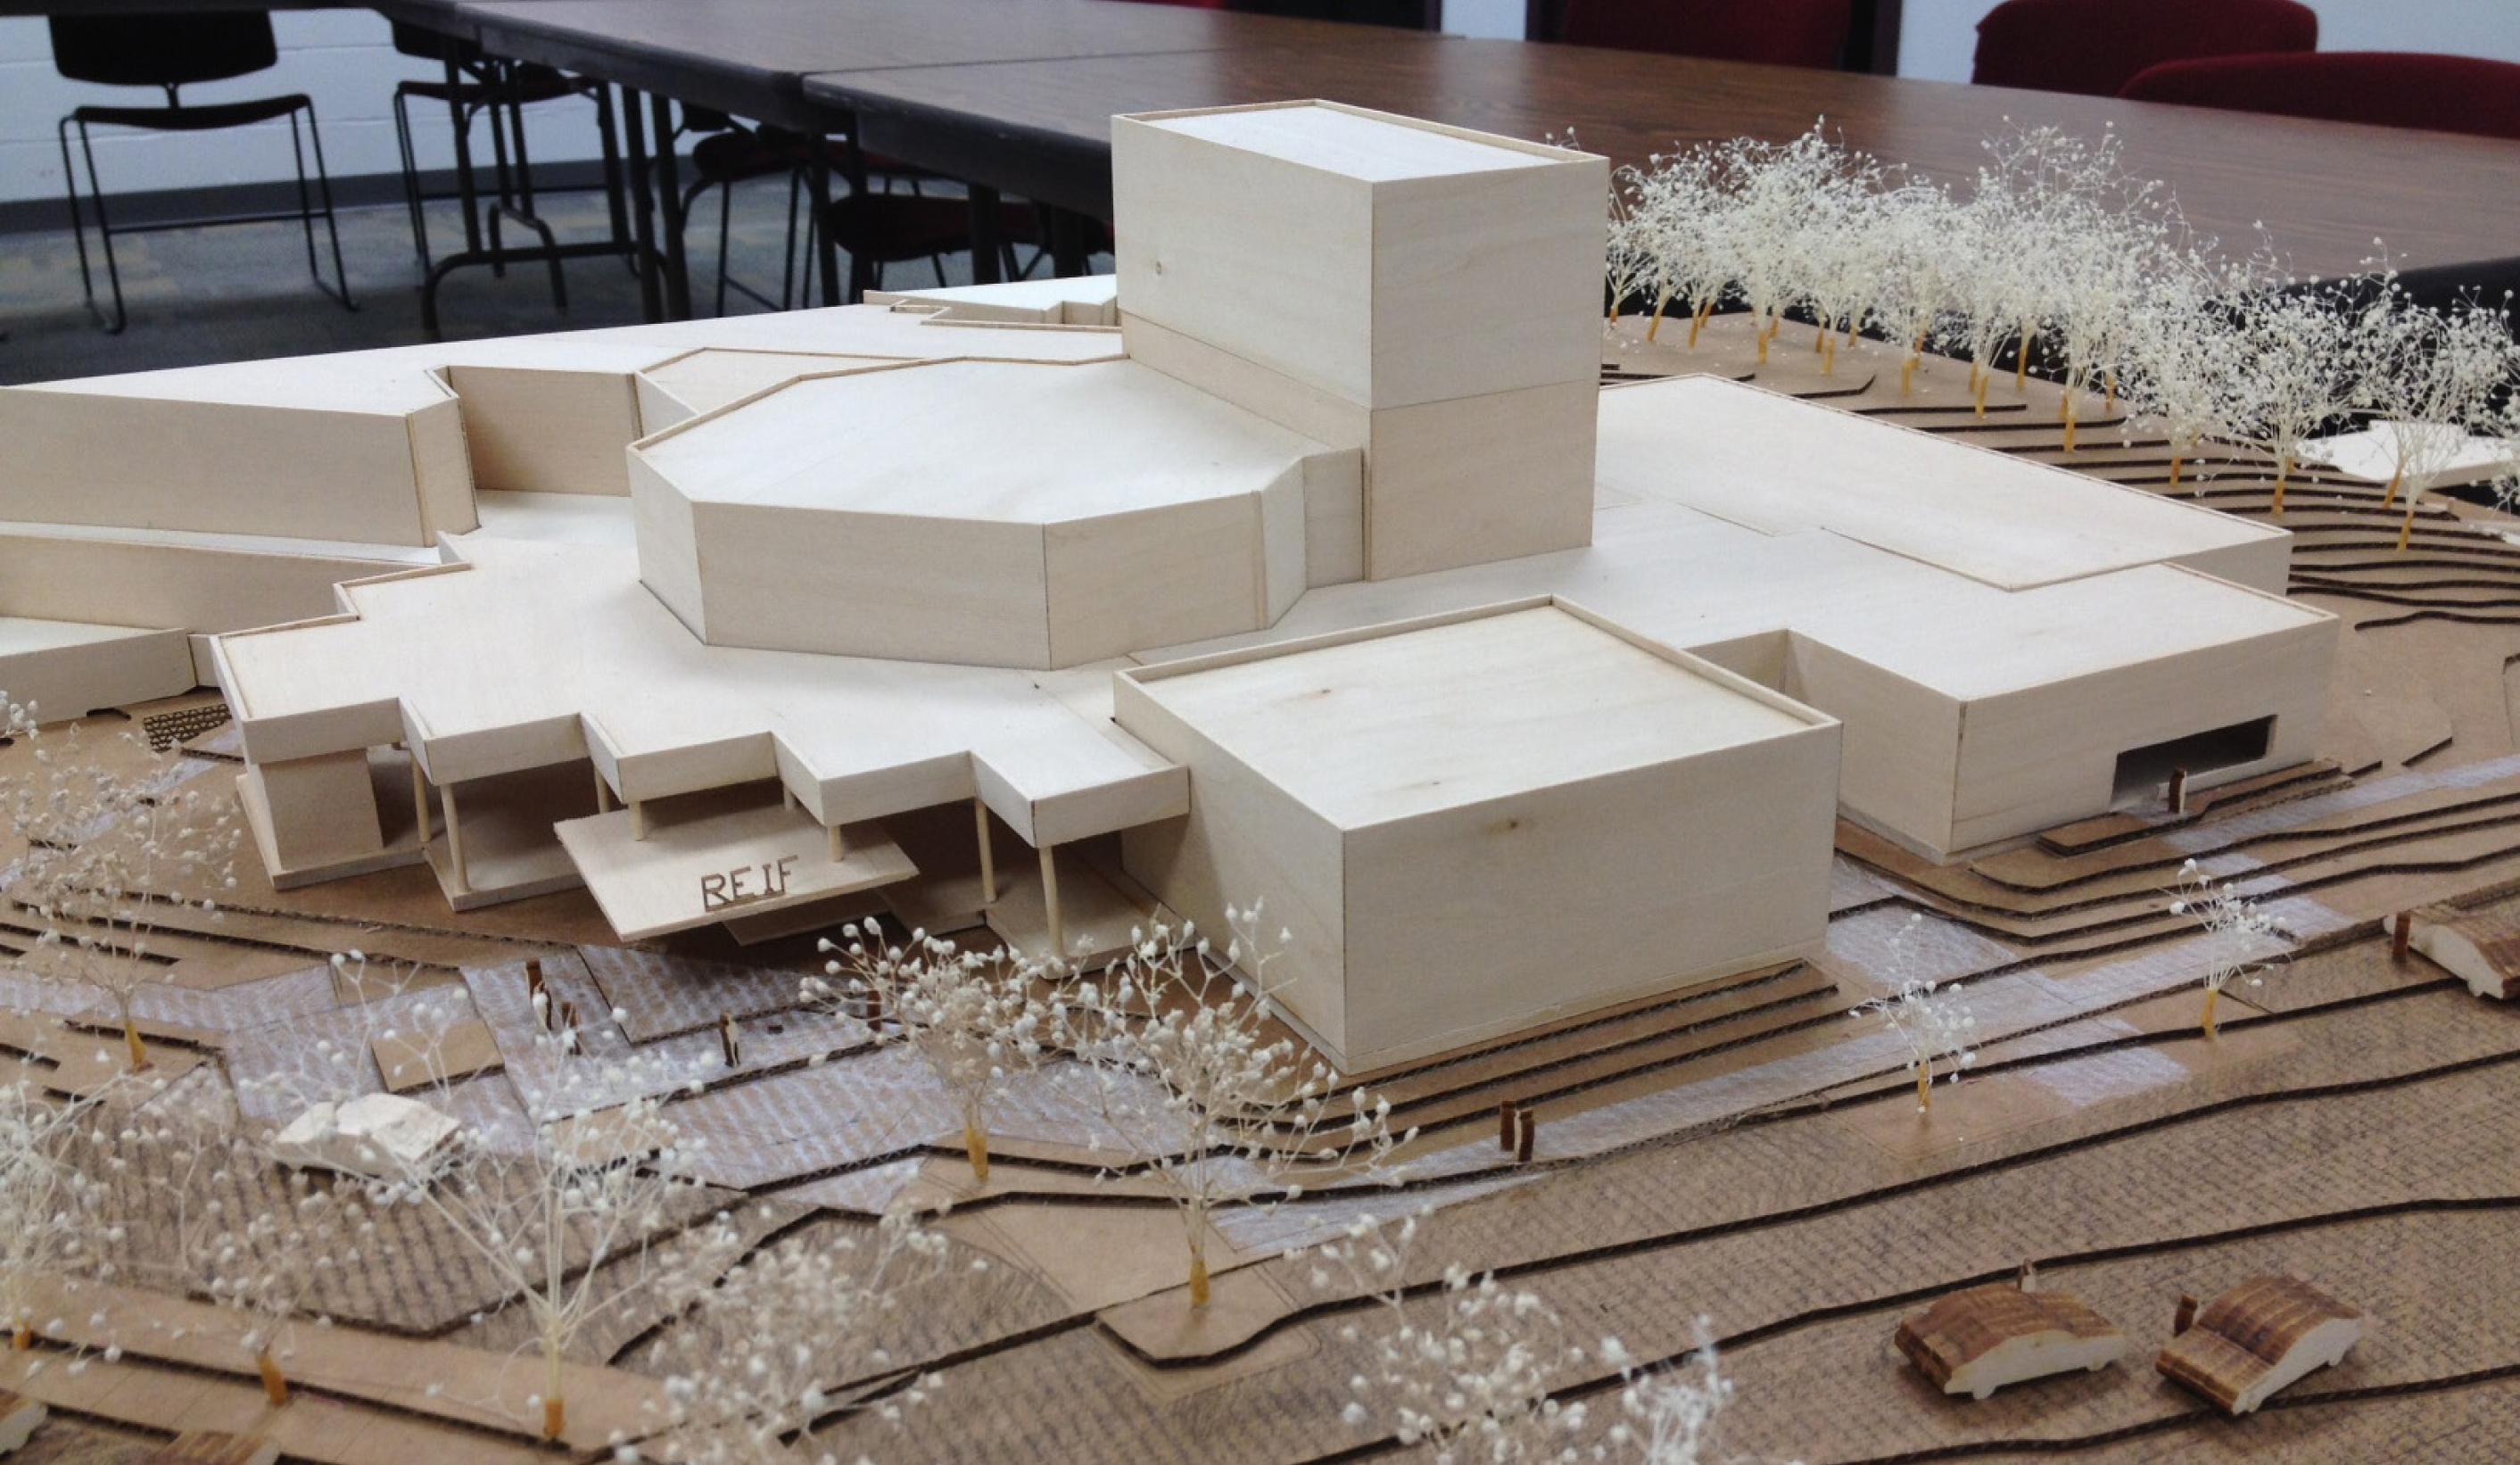 Renovation model